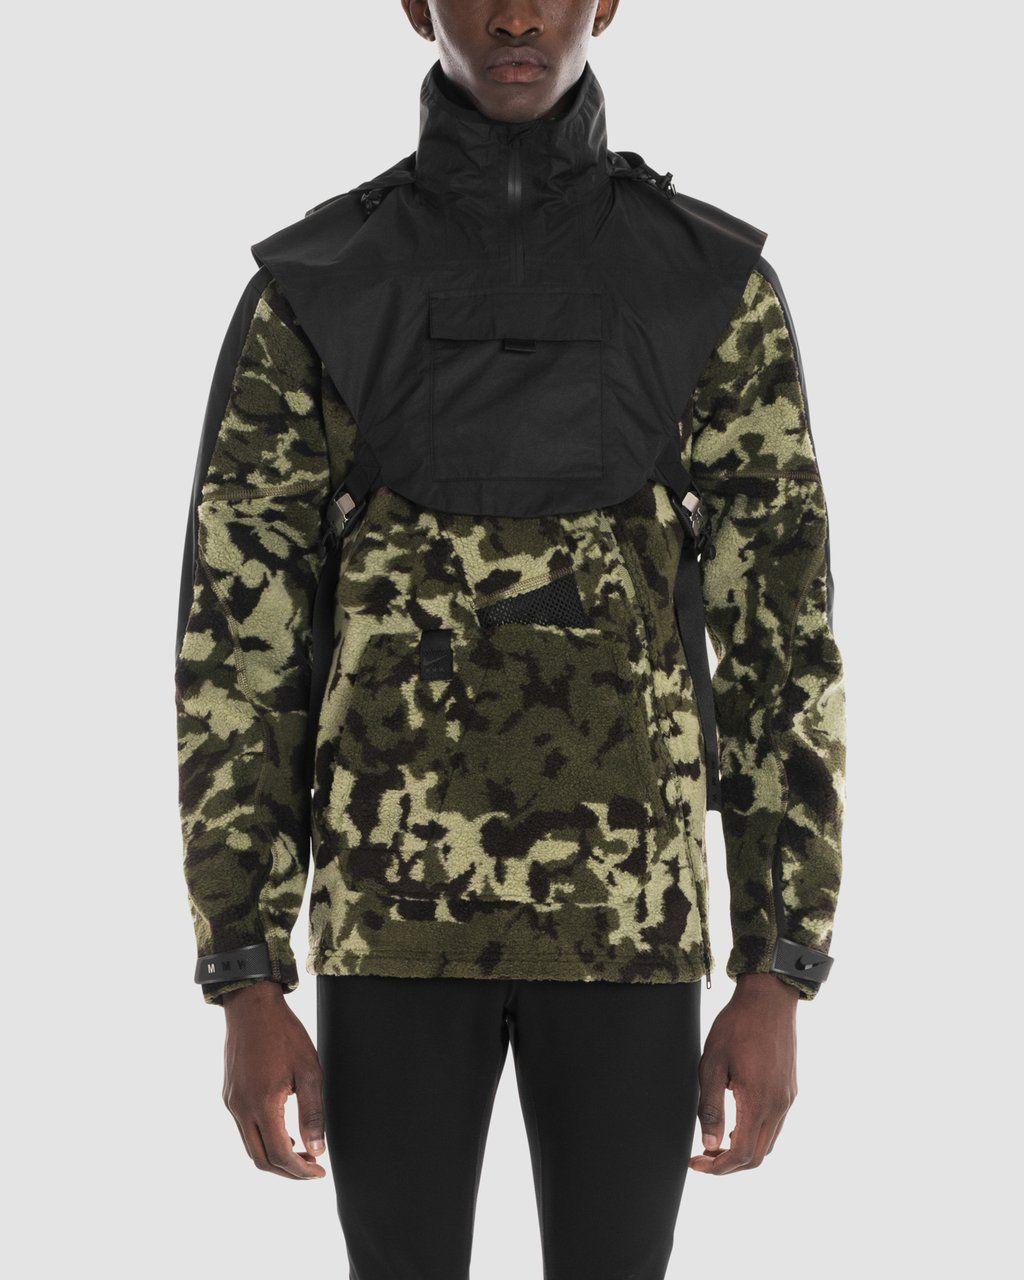 NIKE MMW FLC HD JACKET alyx Jackets, Camo jacket, Mens